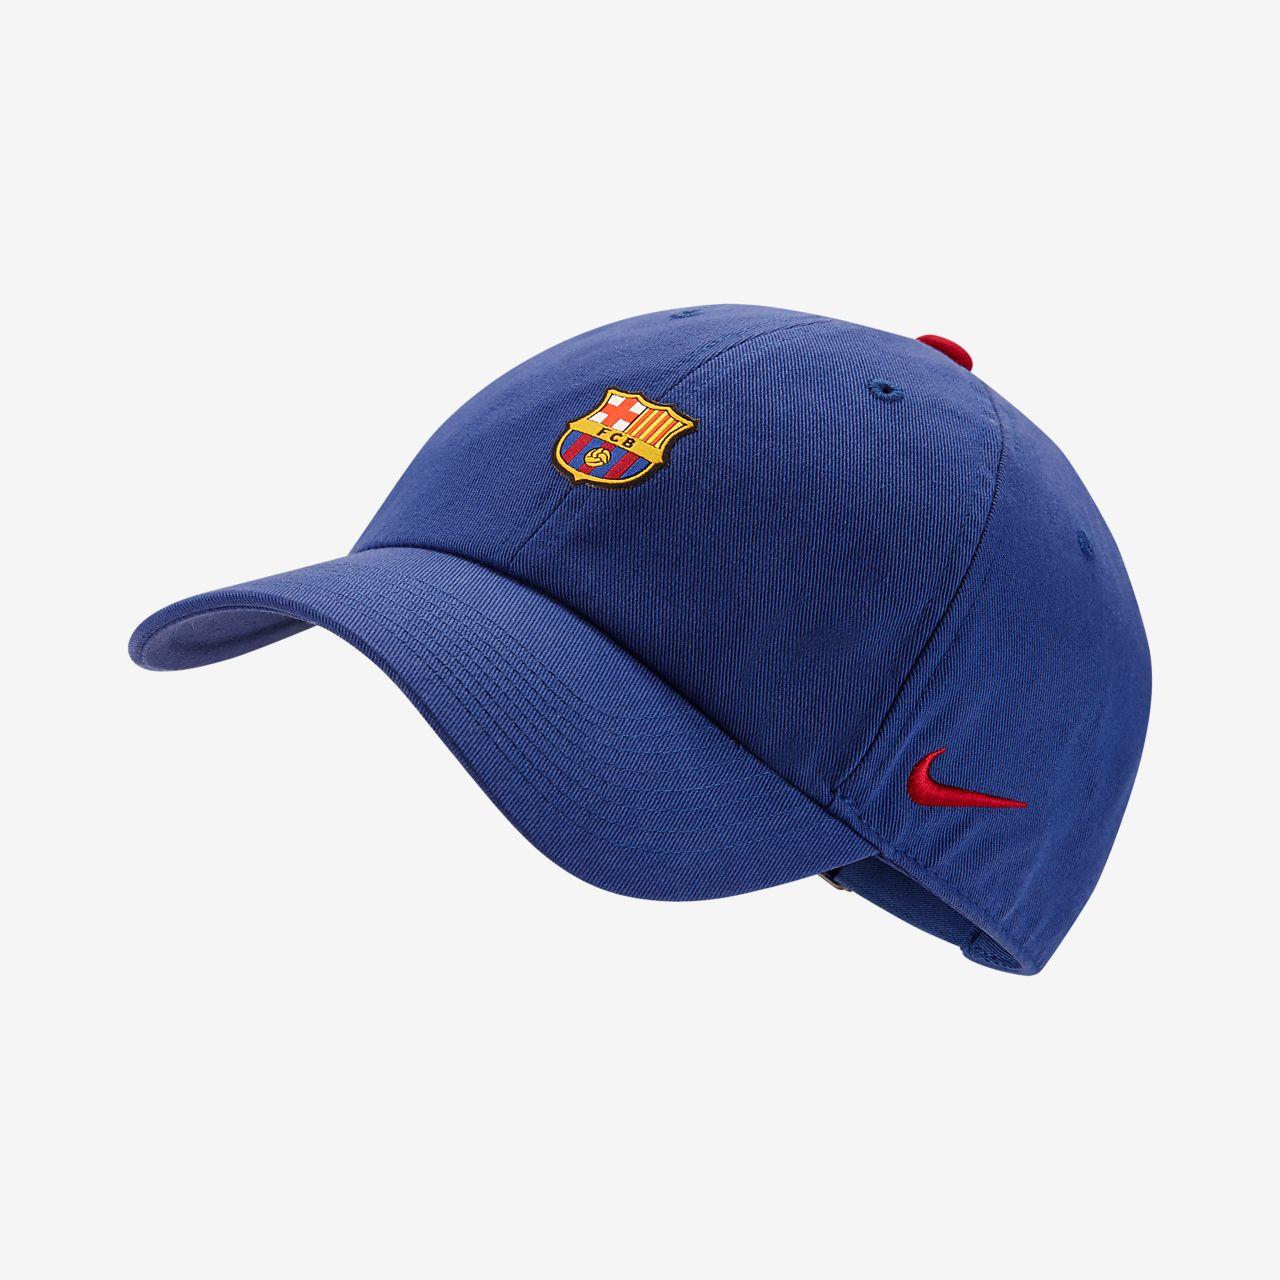 ae22040065e FC Barcelona Heritage 86 Adjustable Hat. Nike.com IE